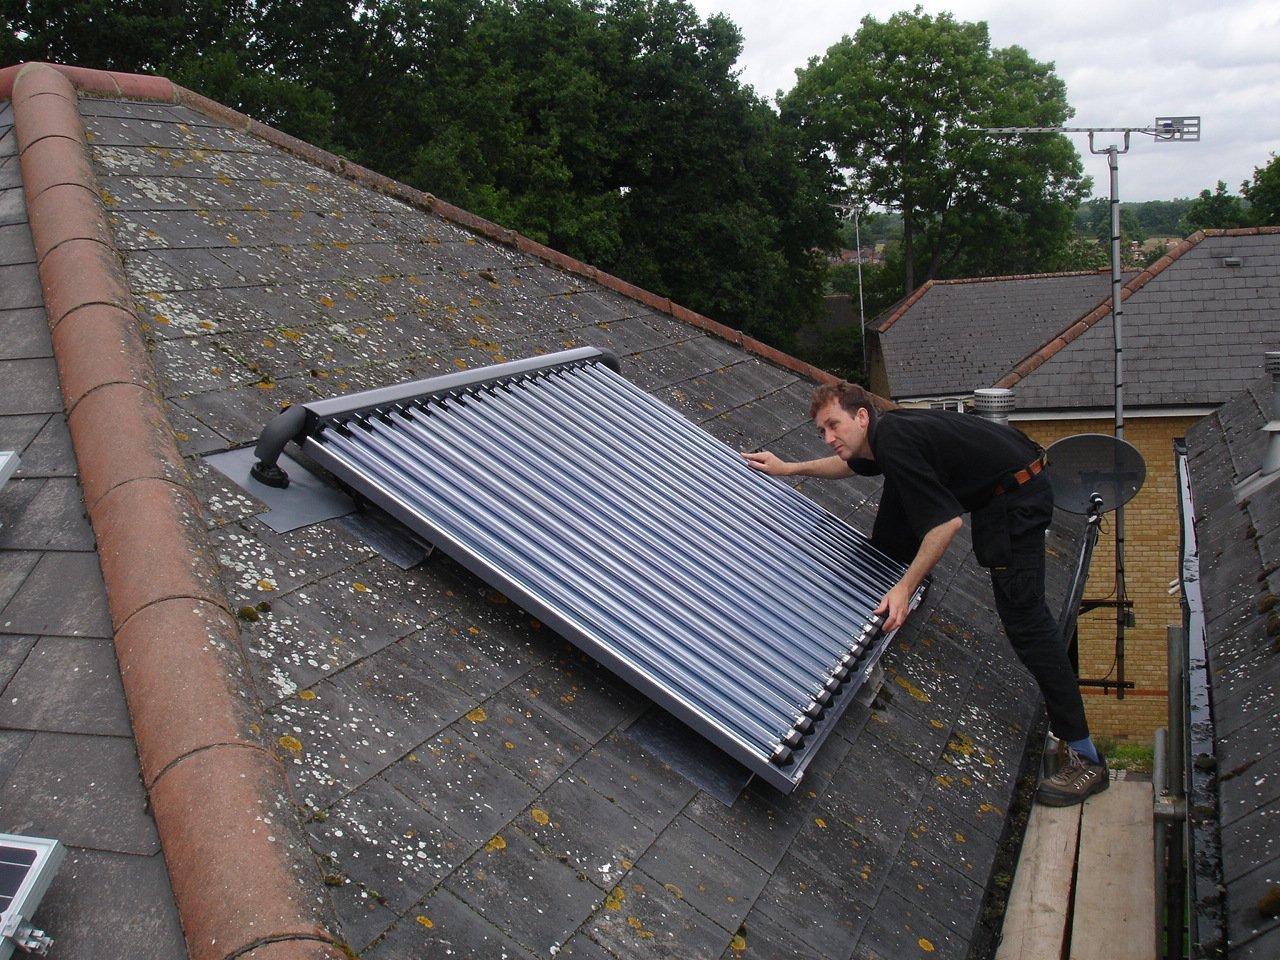 Solar hot water heating Bournville, Harborne, Edgbaston, Moseley & Kings Heath